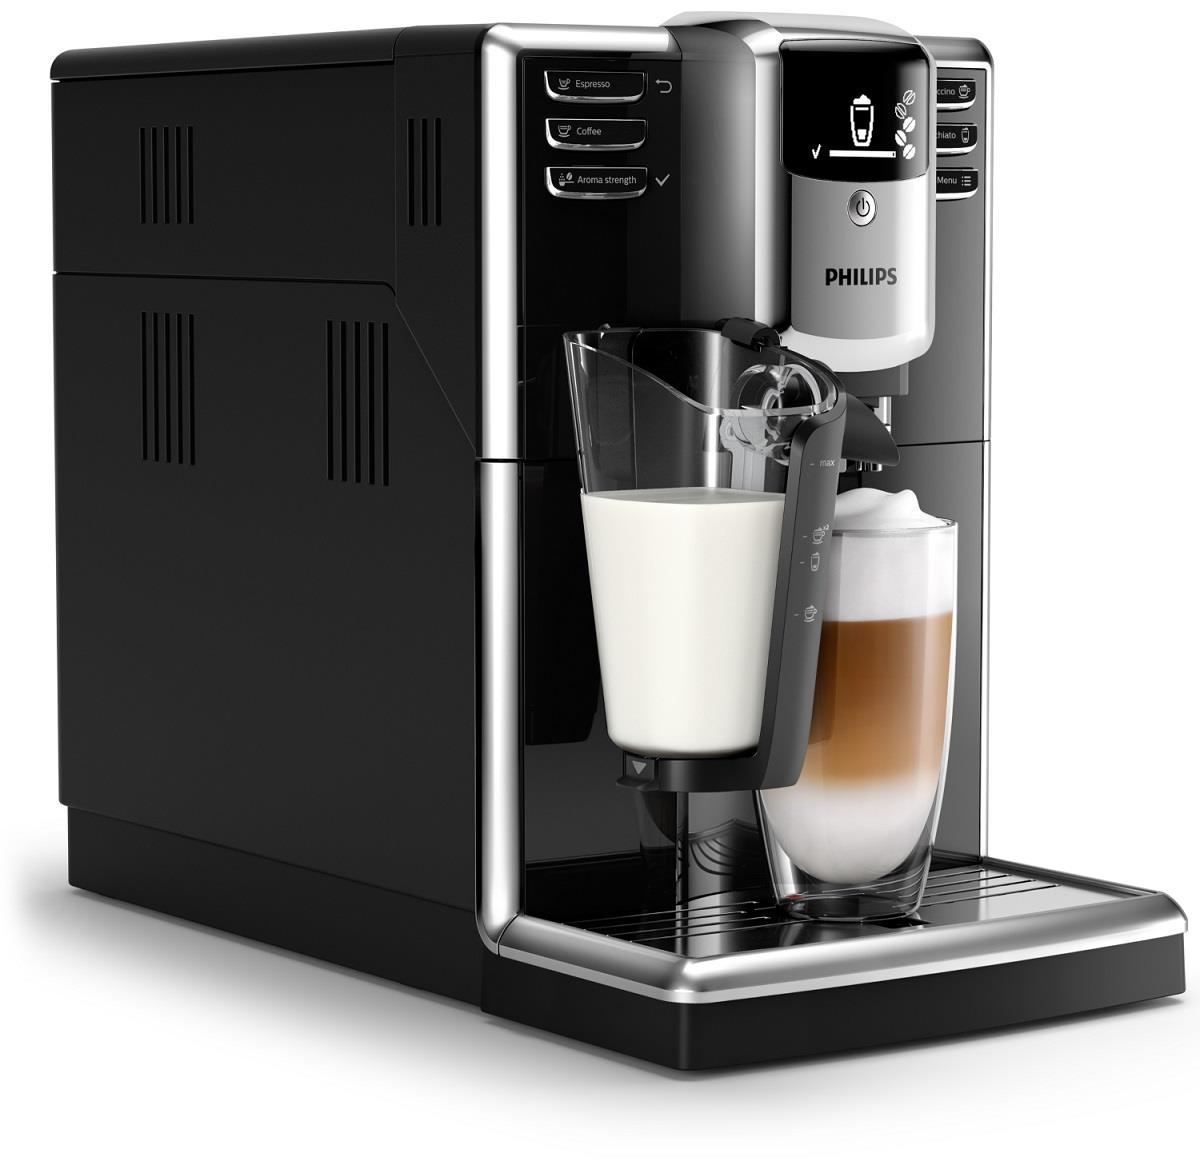 Aparat za kavo EP5330/10 LATTE GO PHILIPS